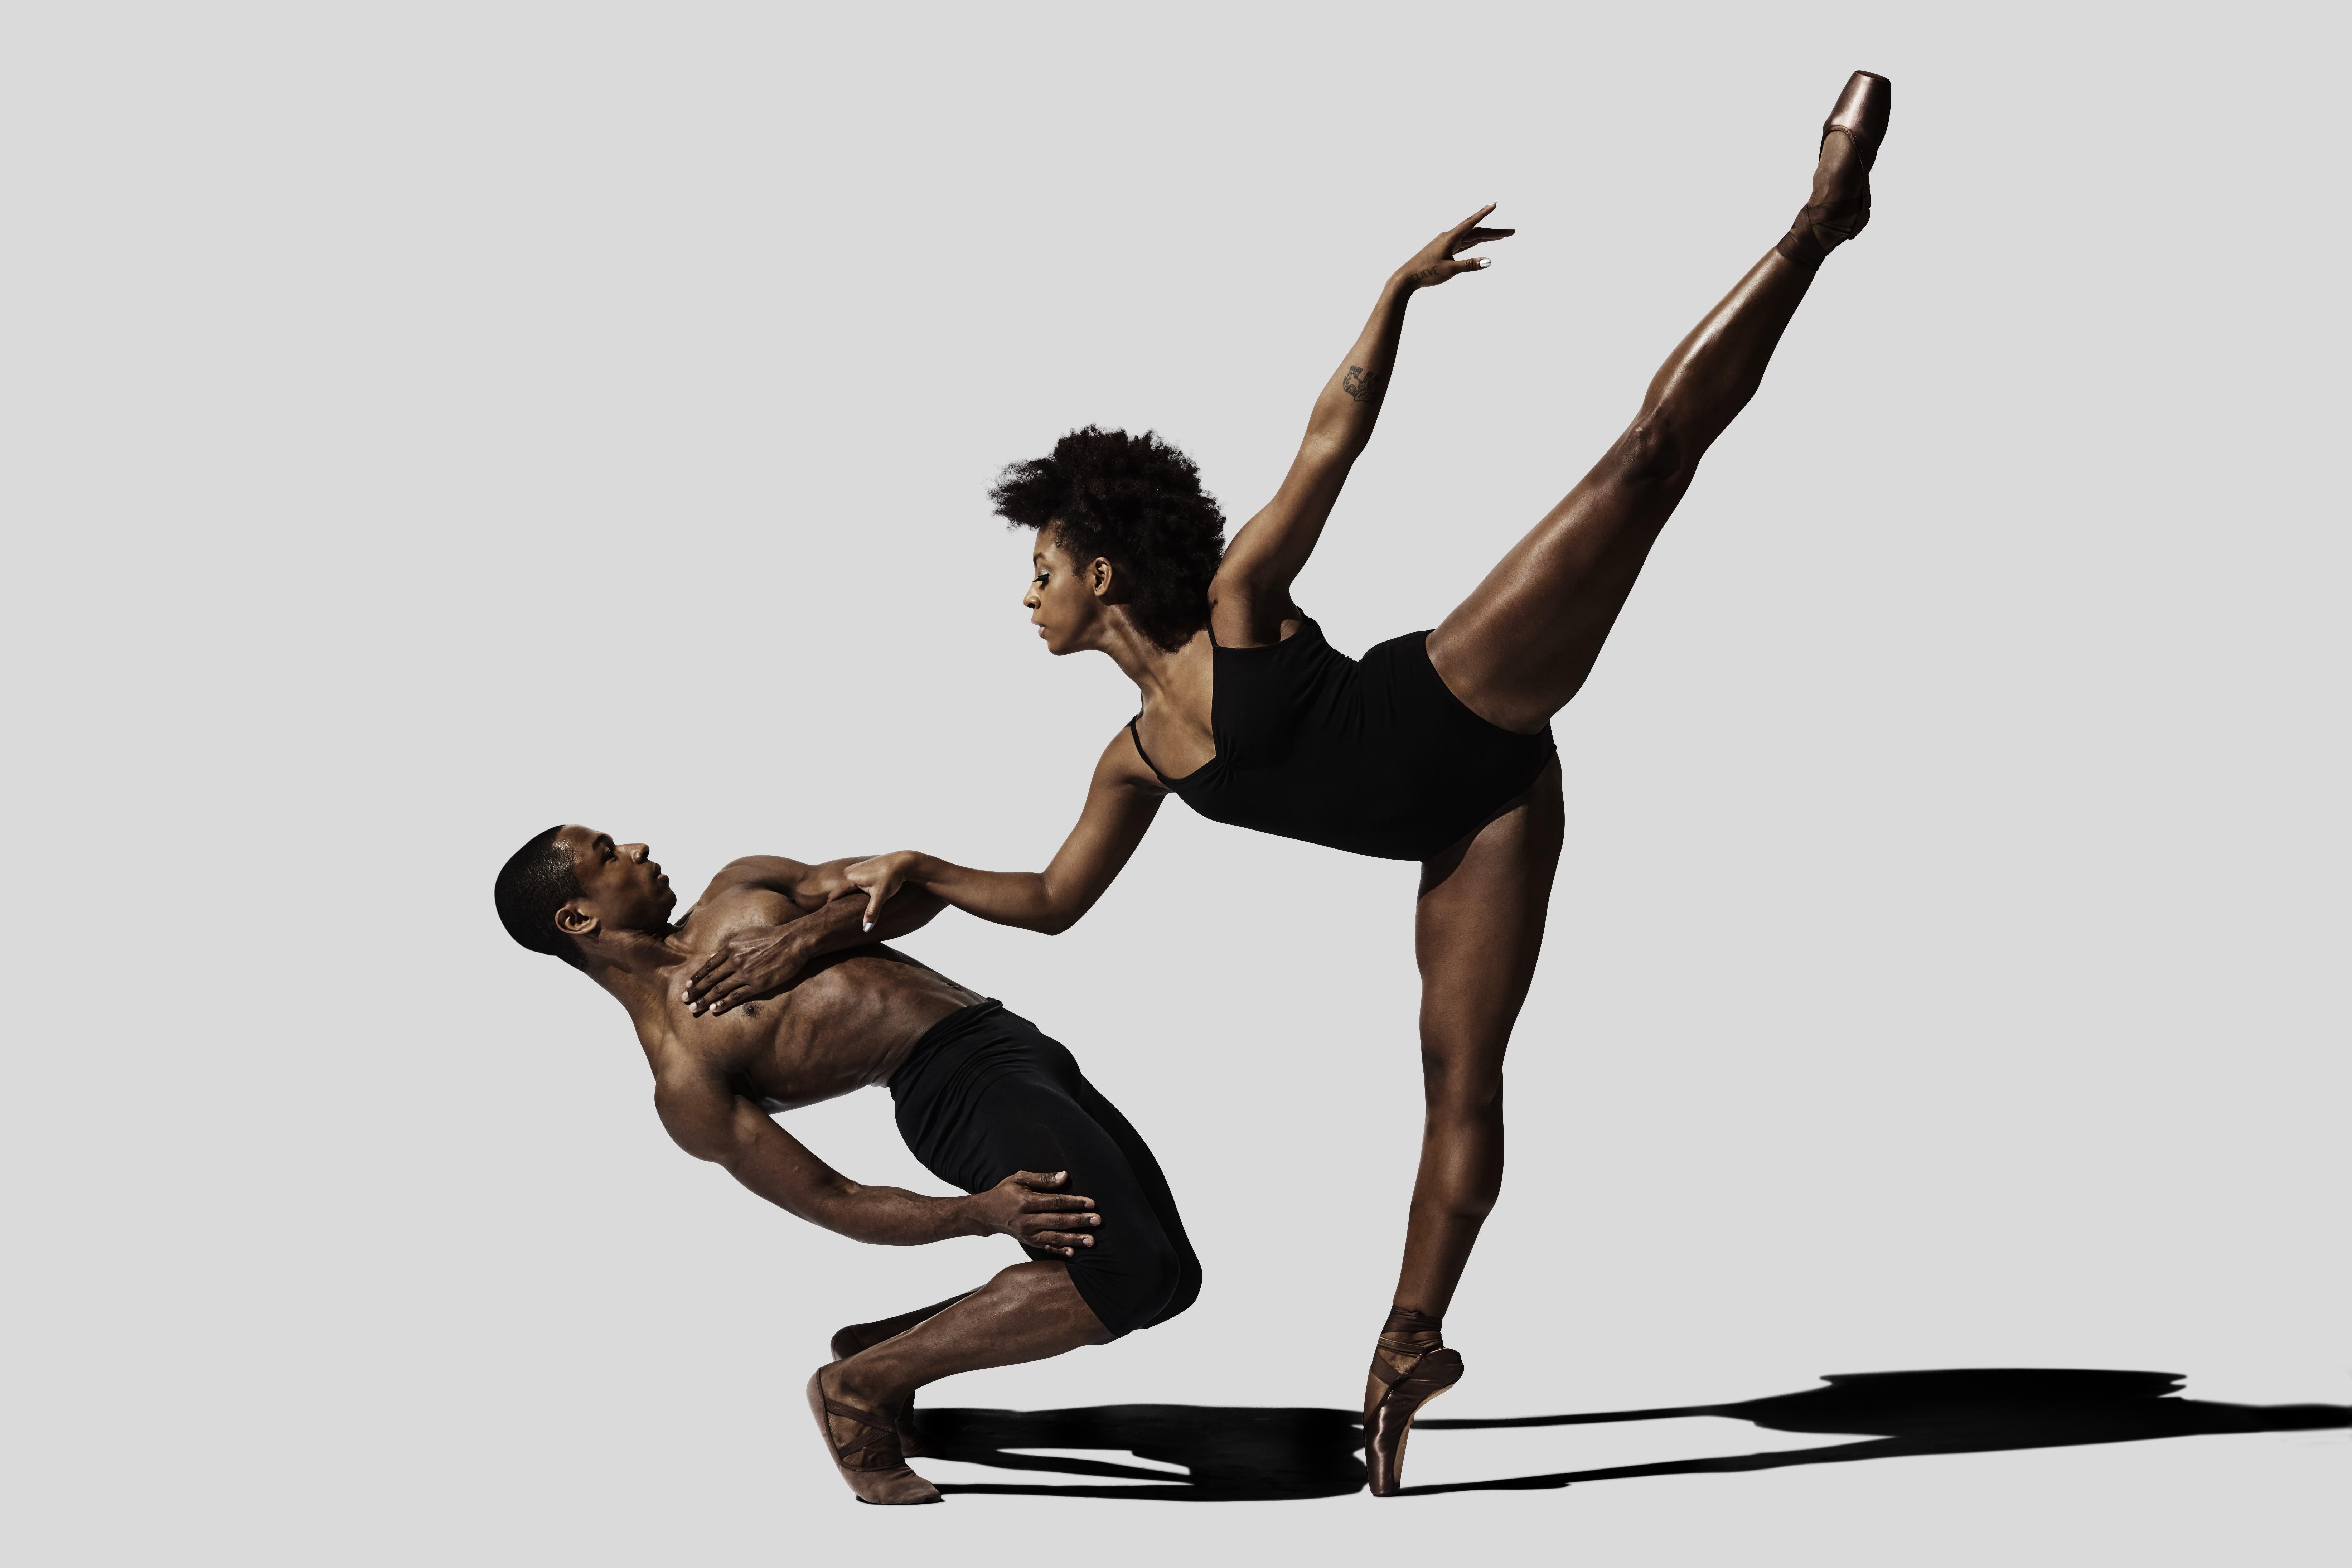 ballet black 2 w7lfqb